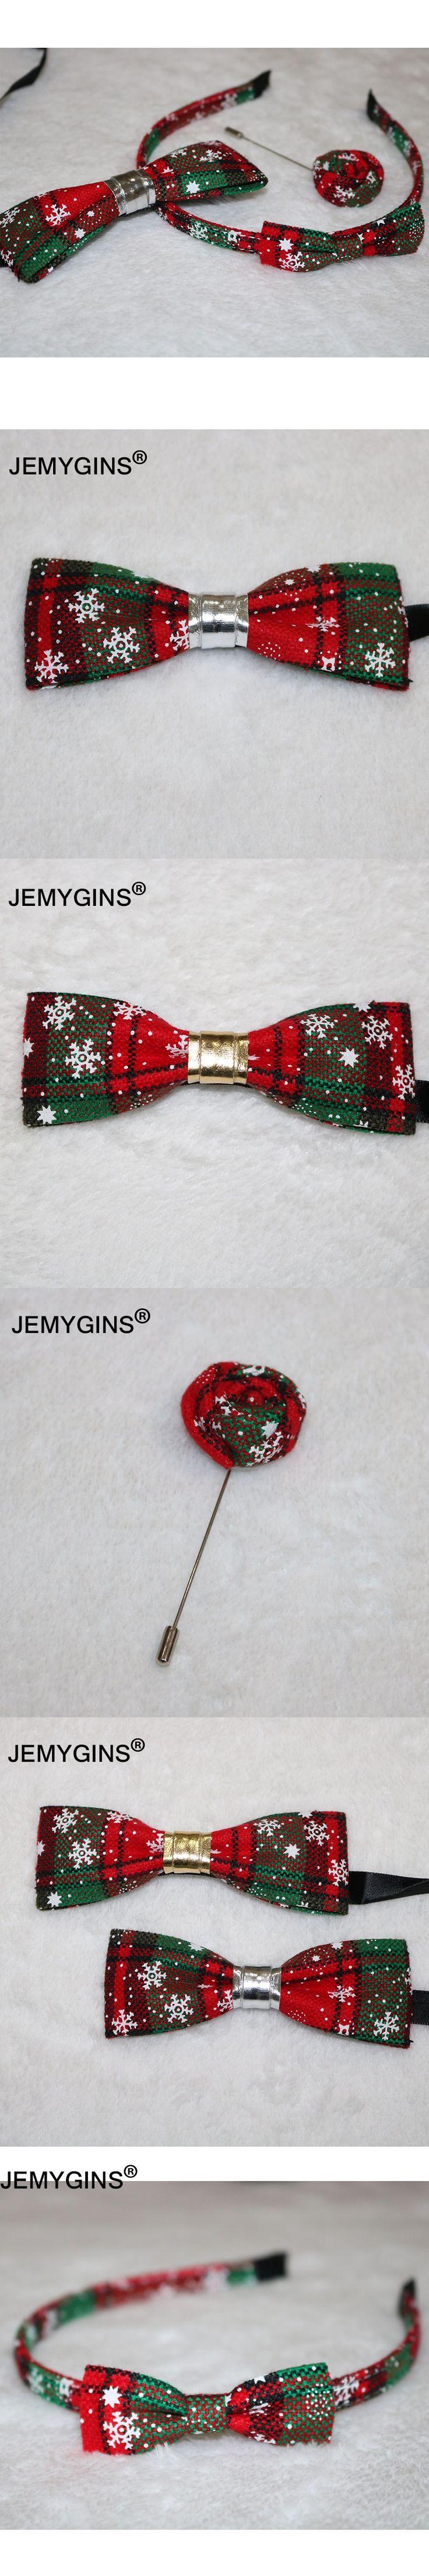 JEMYGINS Fashion Family Christmas Suit Cotton Linen Men&Boy Bow Tie Brooch Corsage Girl Hair Hoop Handmade Design Self Wedding